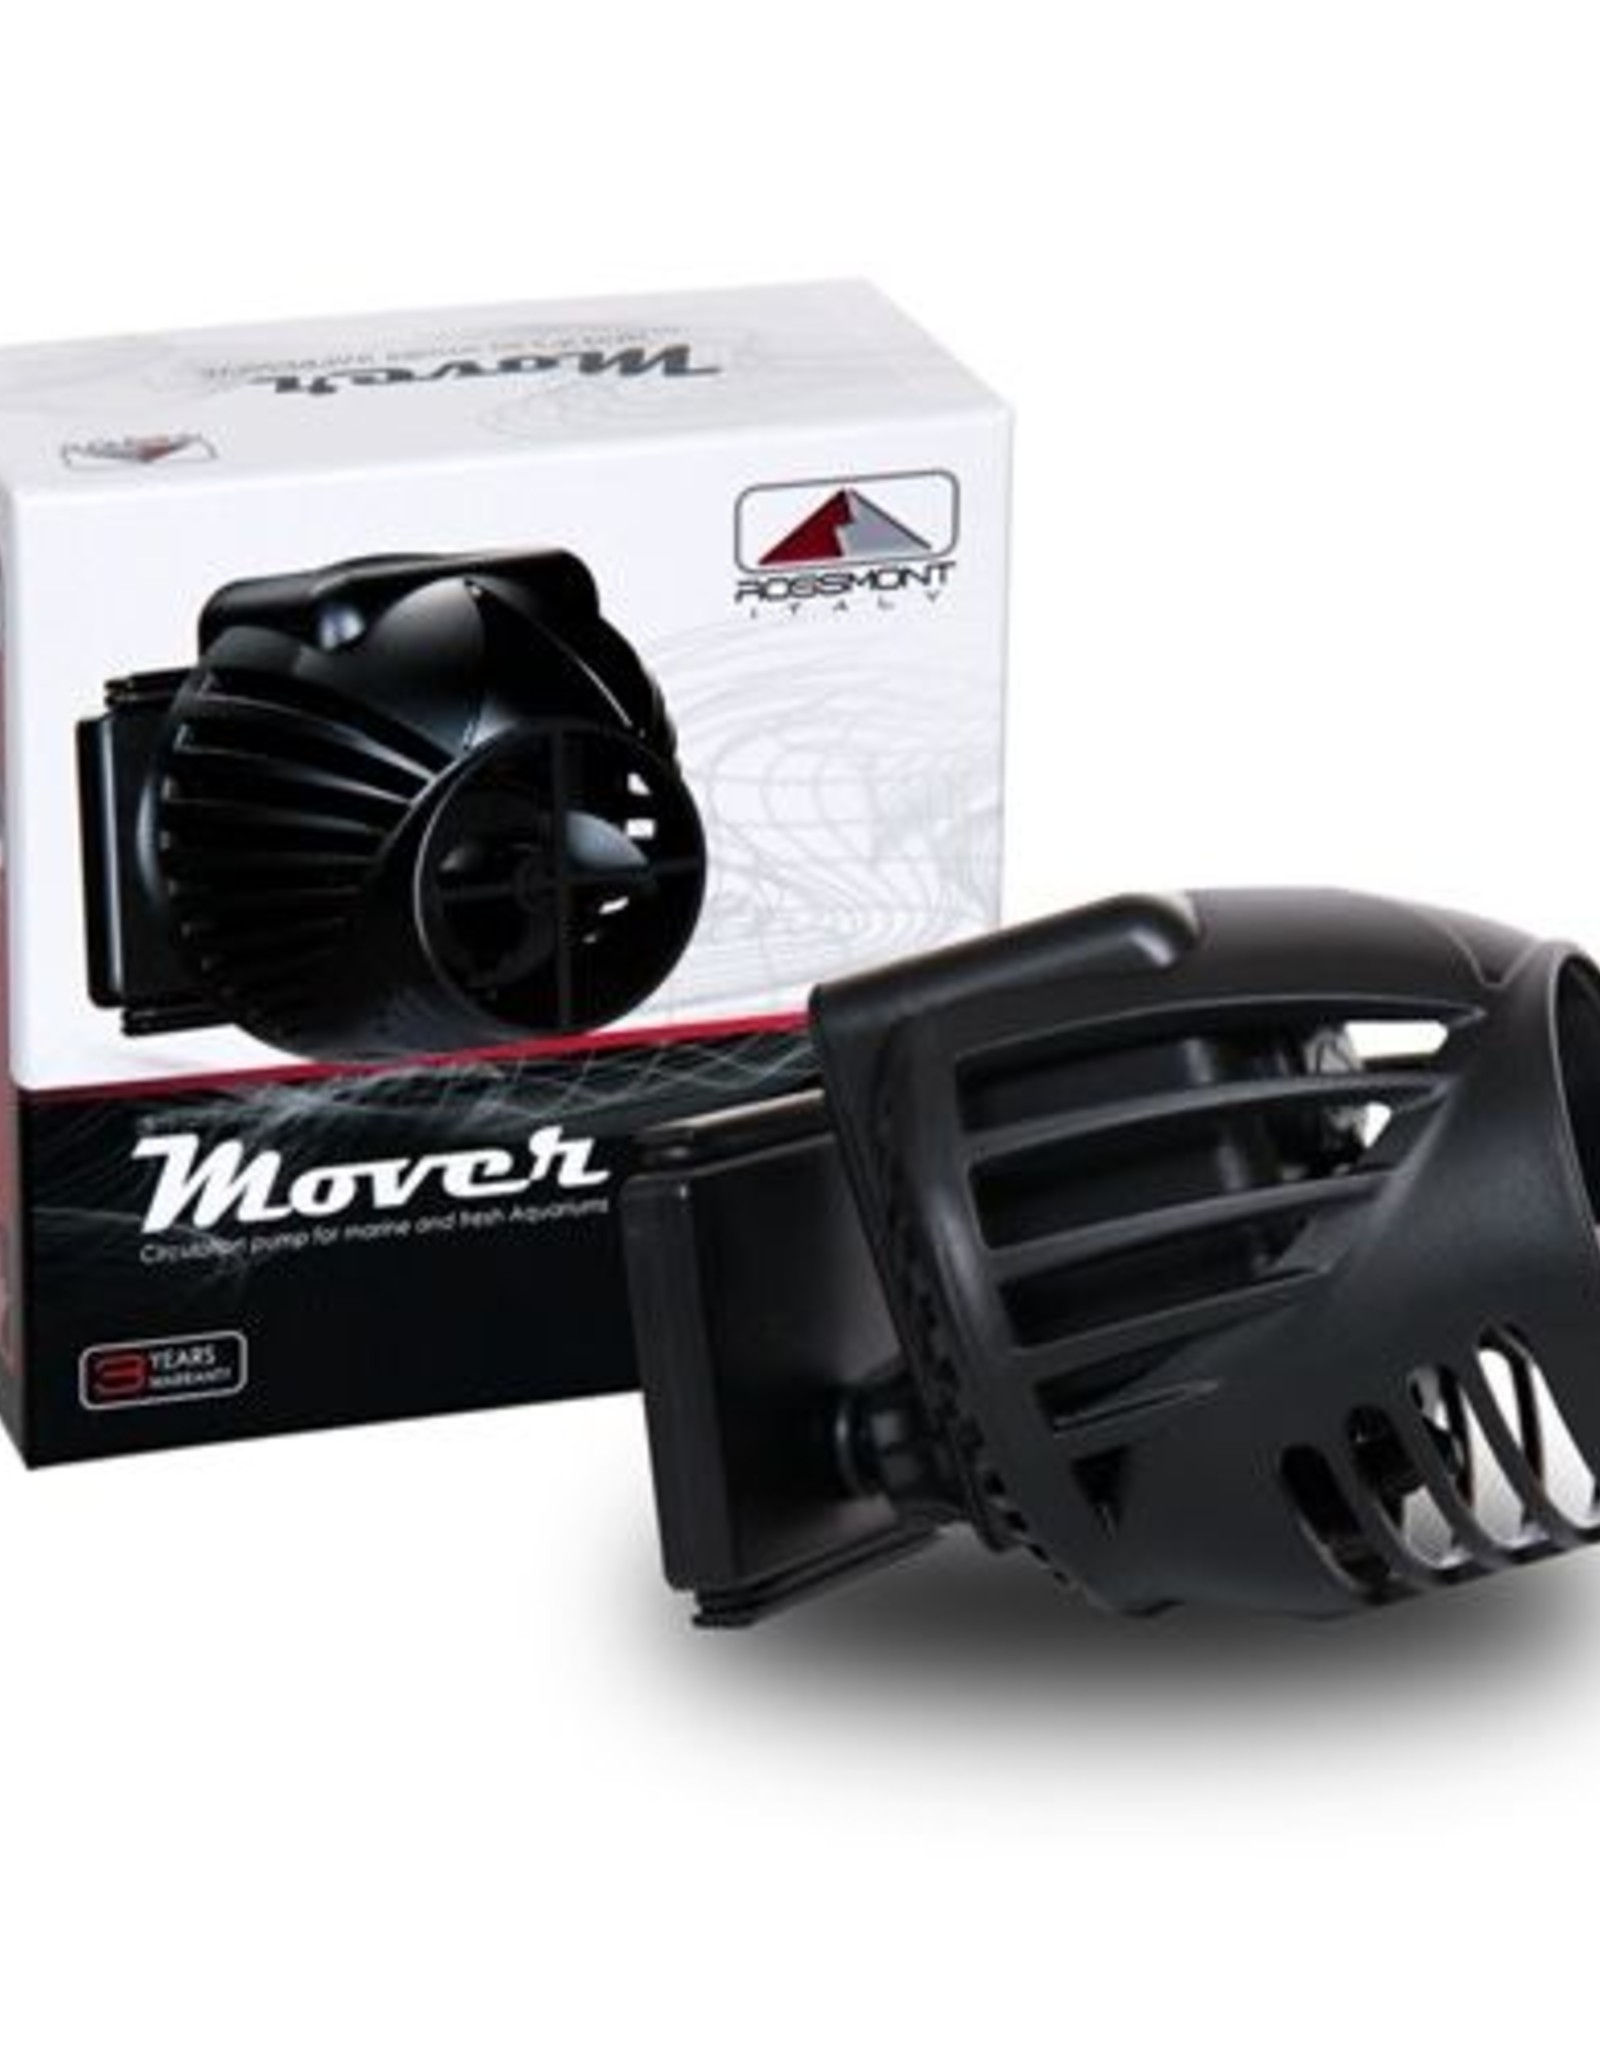 ROSSMONT MOVER MX3500 PUMP 3500GPH